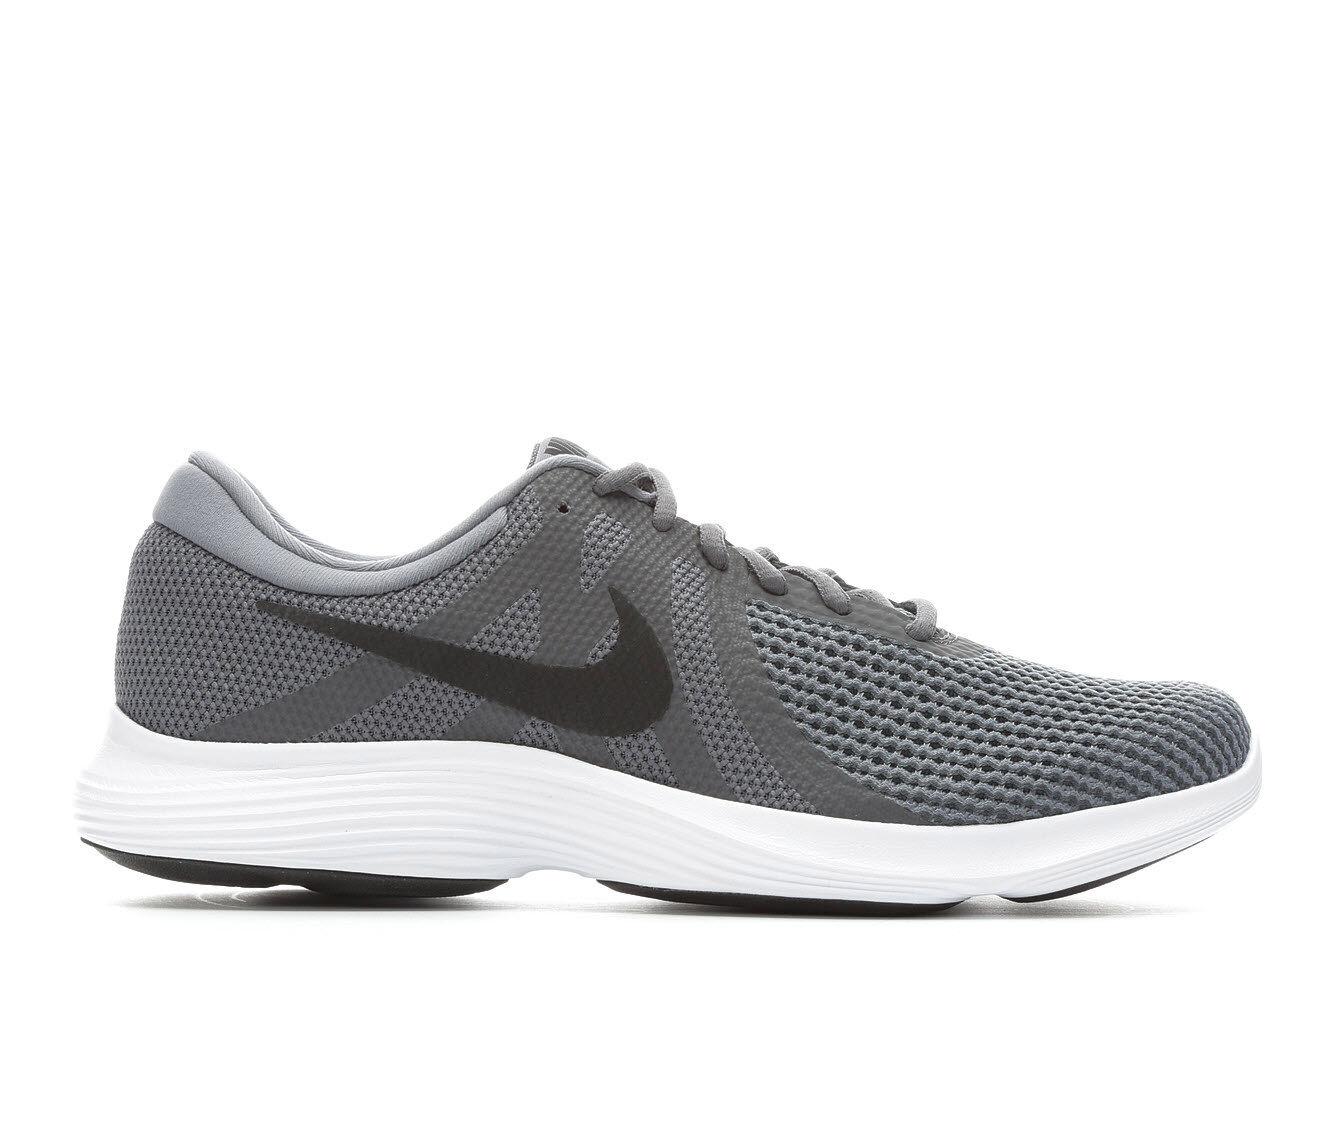 nike tanjun grade school girls' running shoes nz